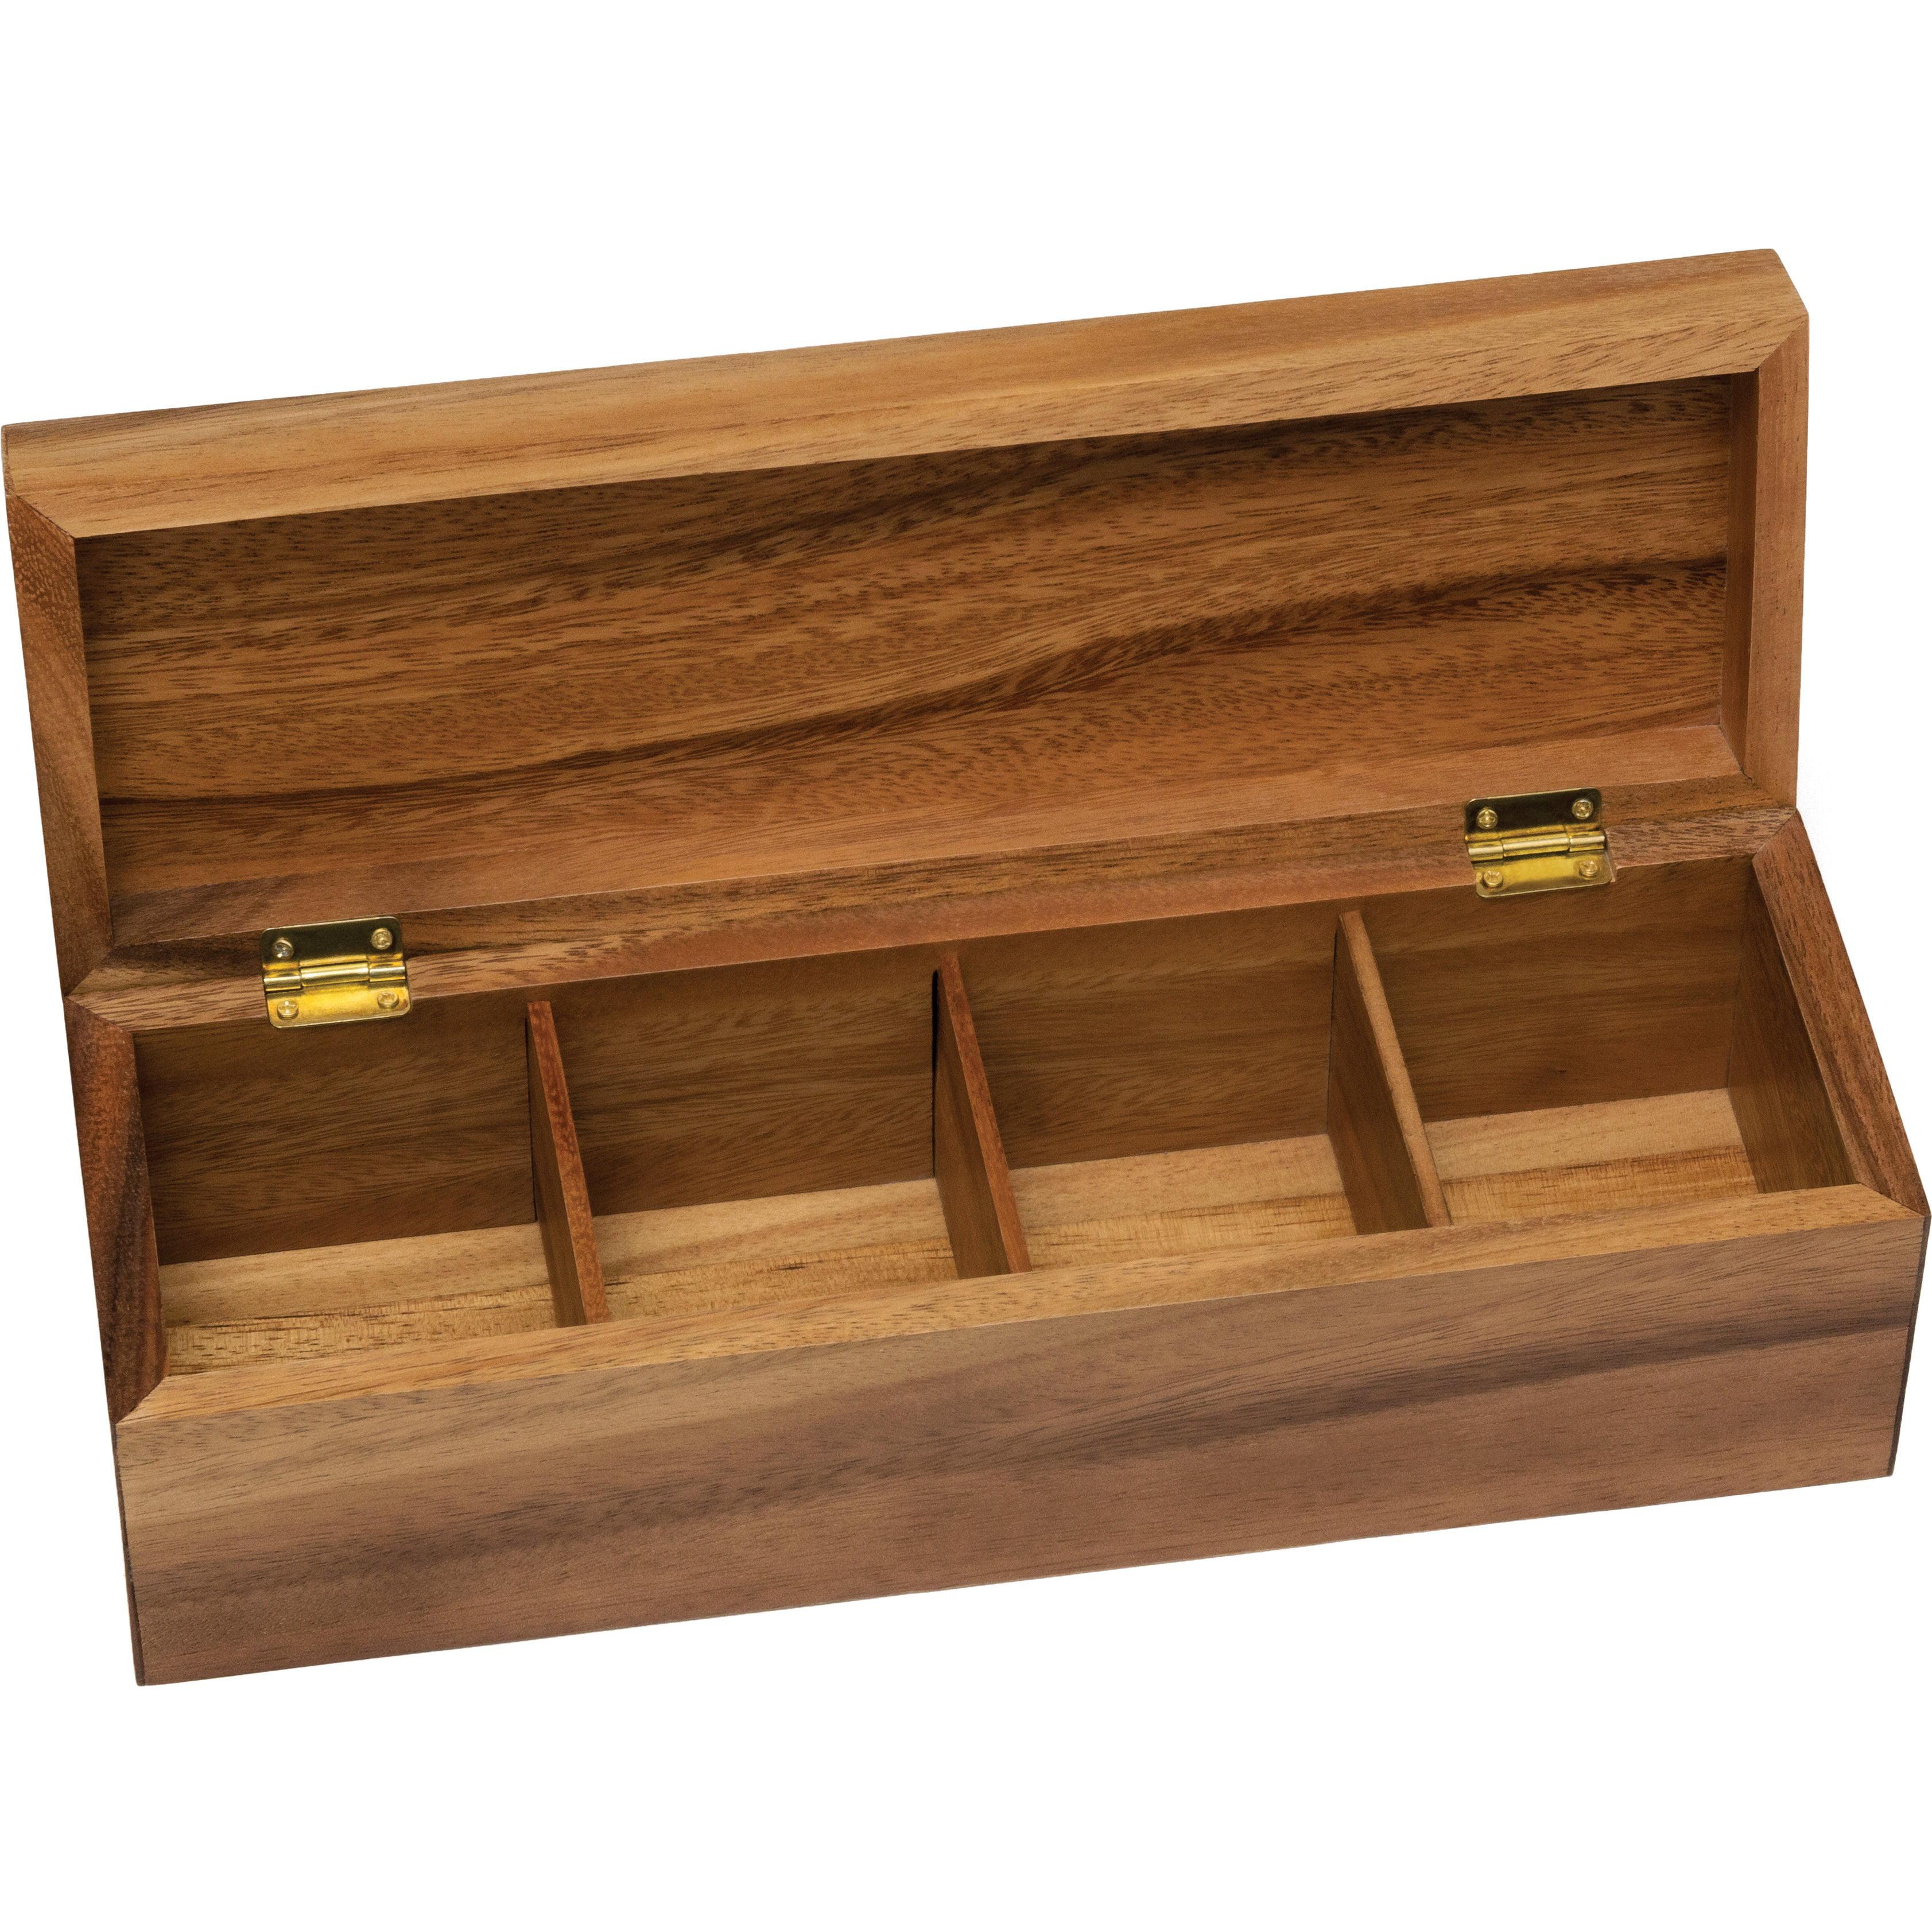 Lipper International Acacia Tea Box, 4-Section